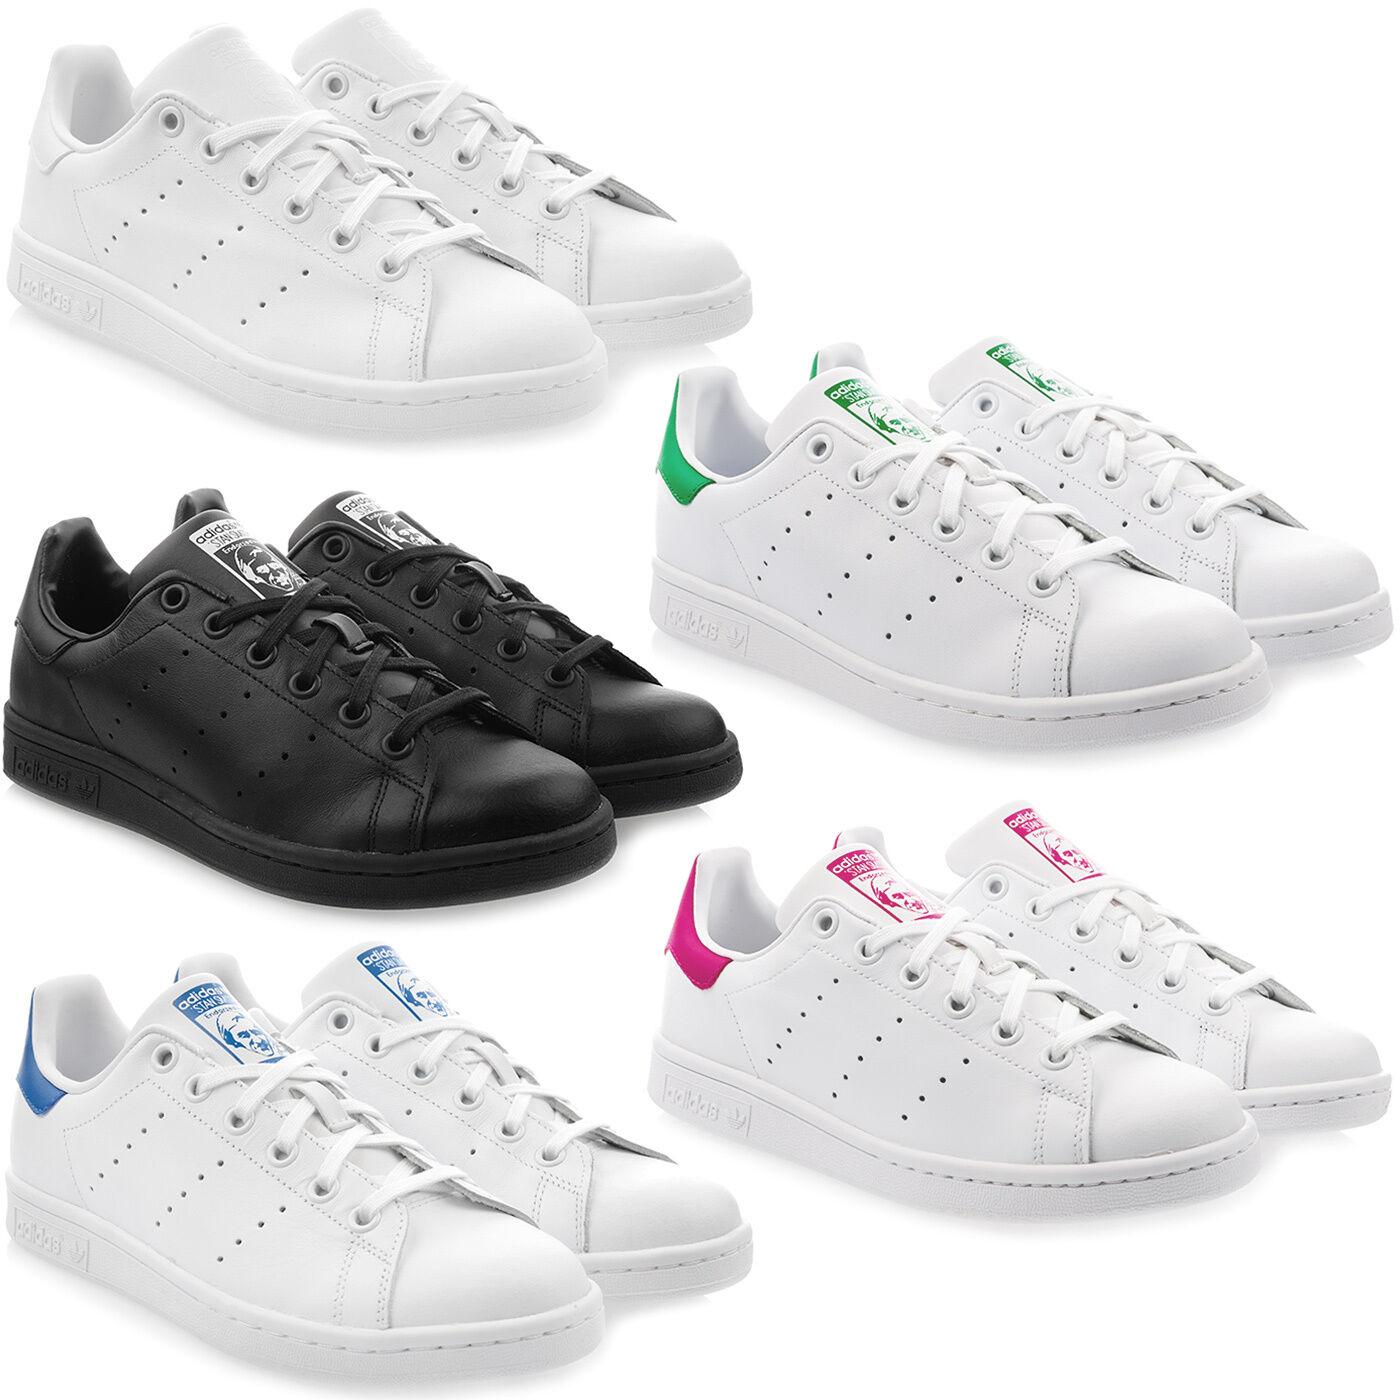 Adidas Stan Smith J Junior Femmes Sneaker Baskets Unisexe Unisexe Unisexe Chaussures De Loisirs Cuir 236b00